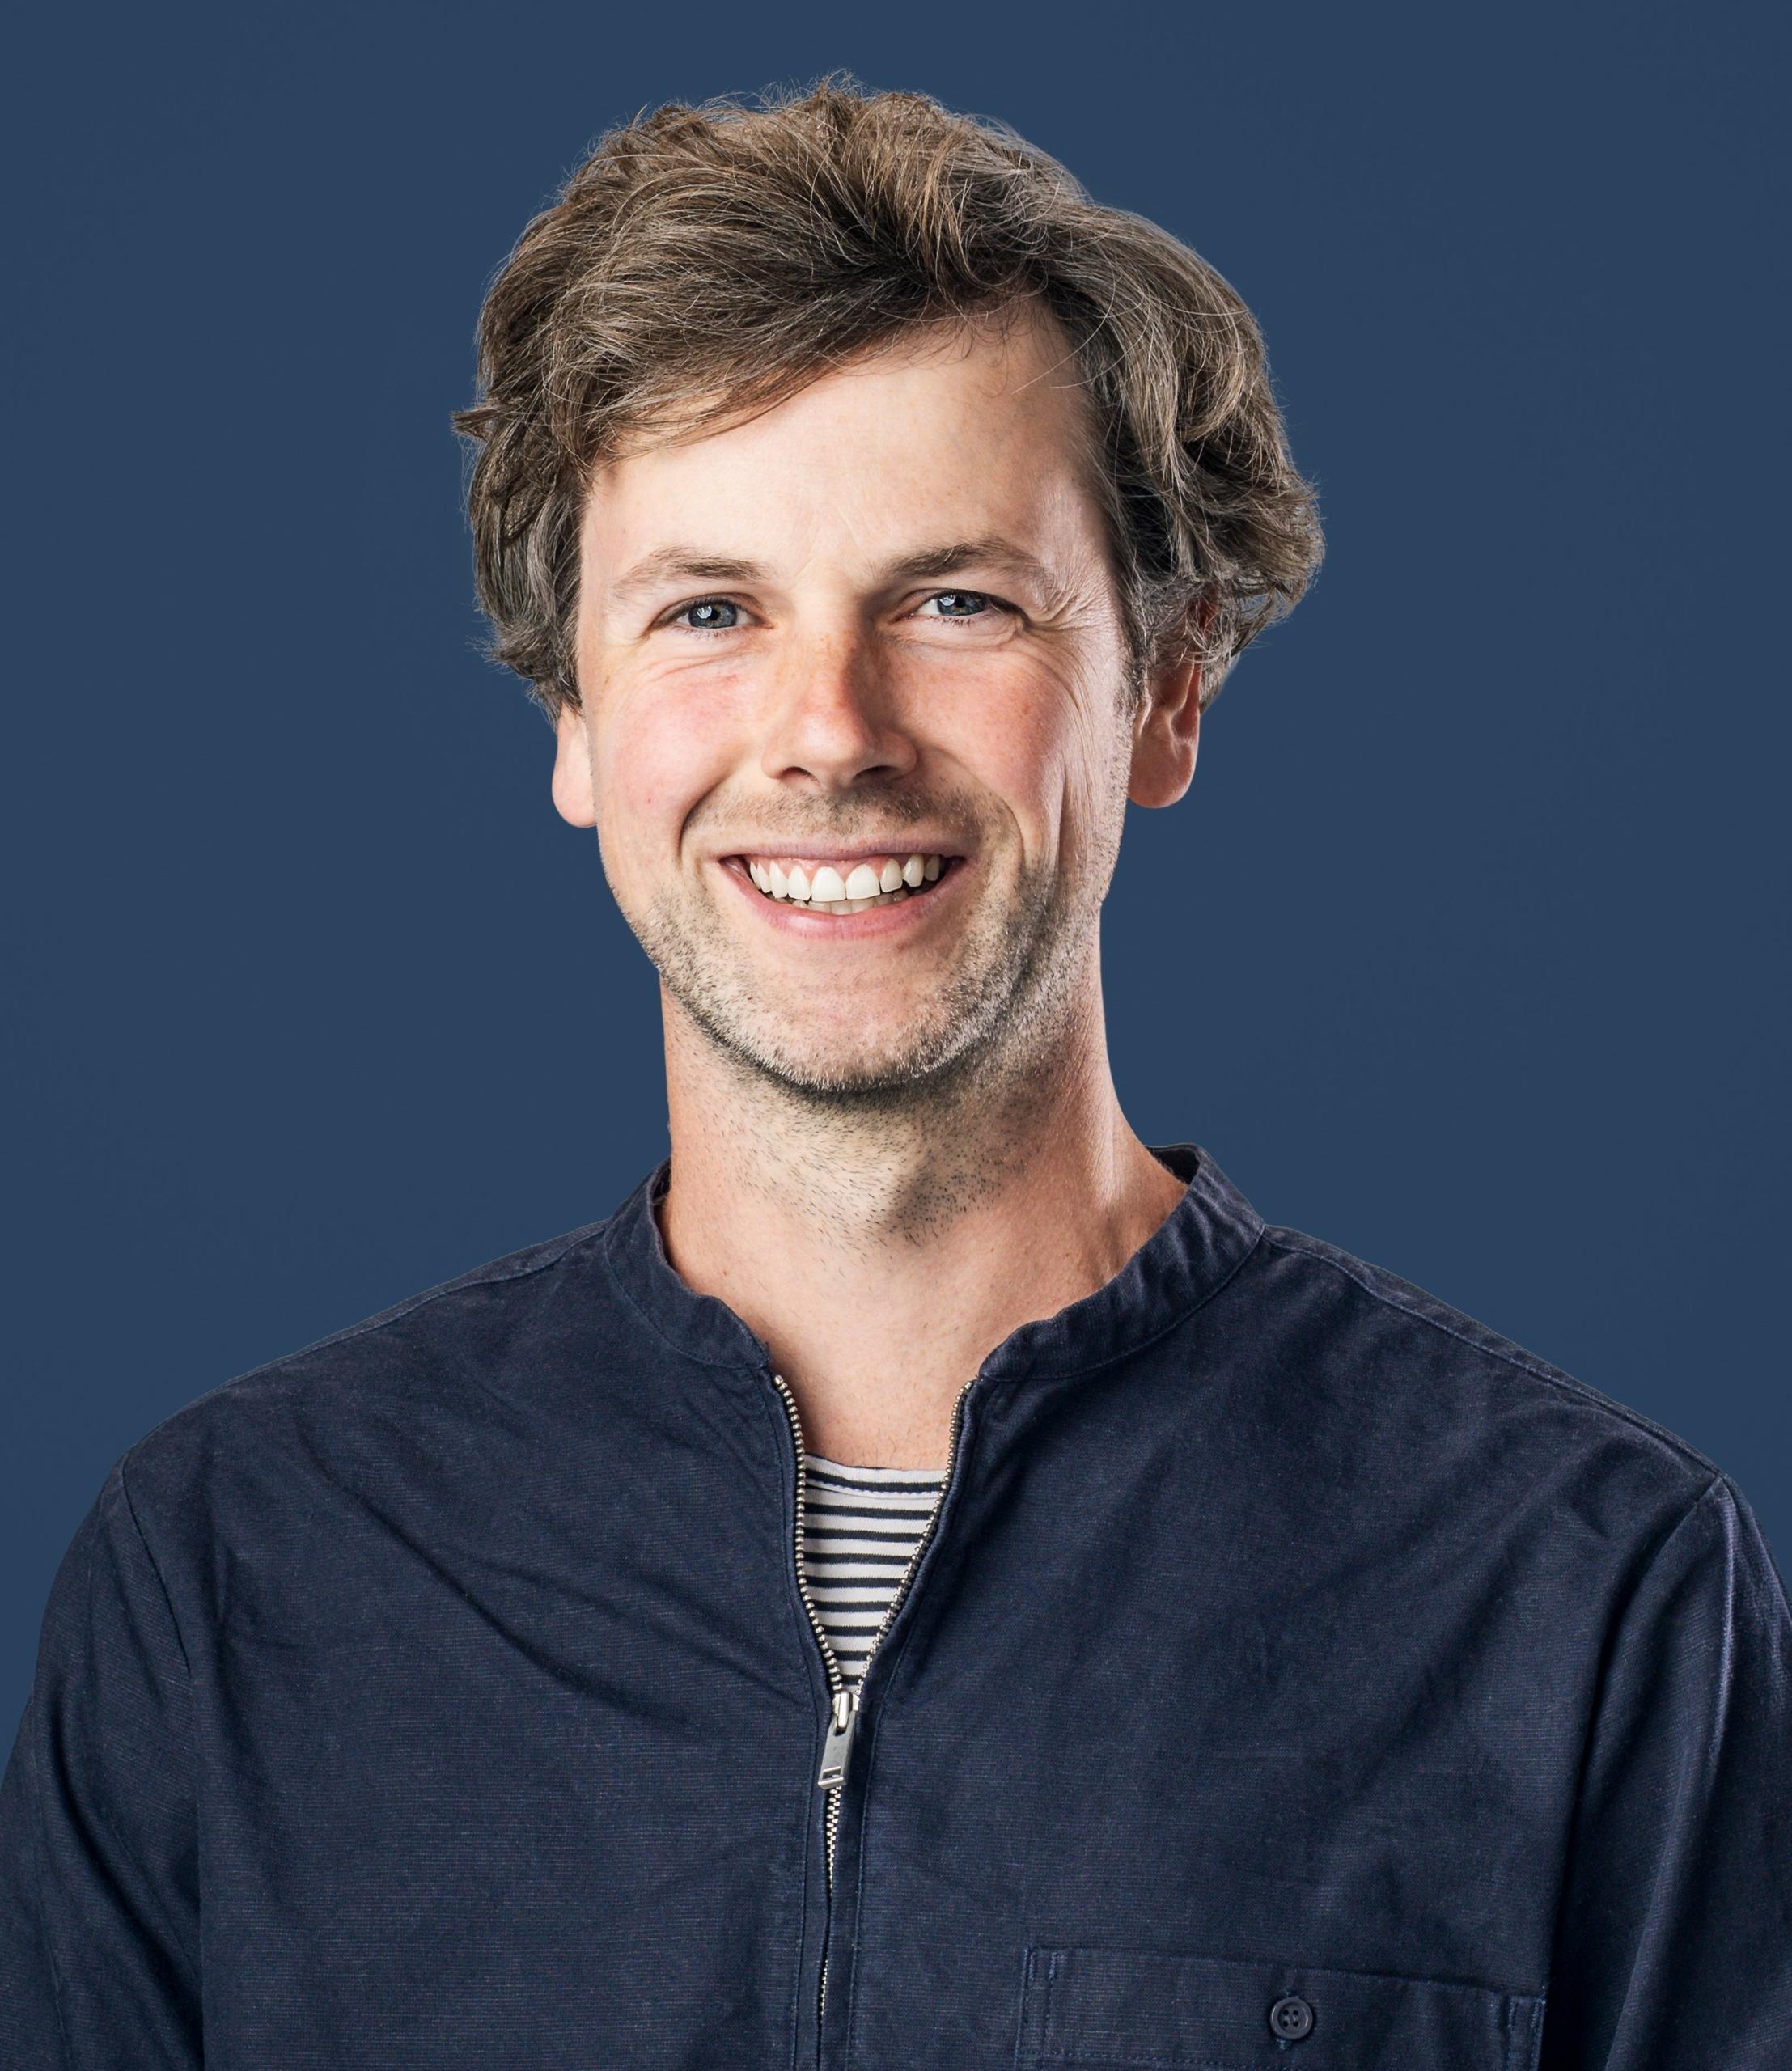 David Westenberg